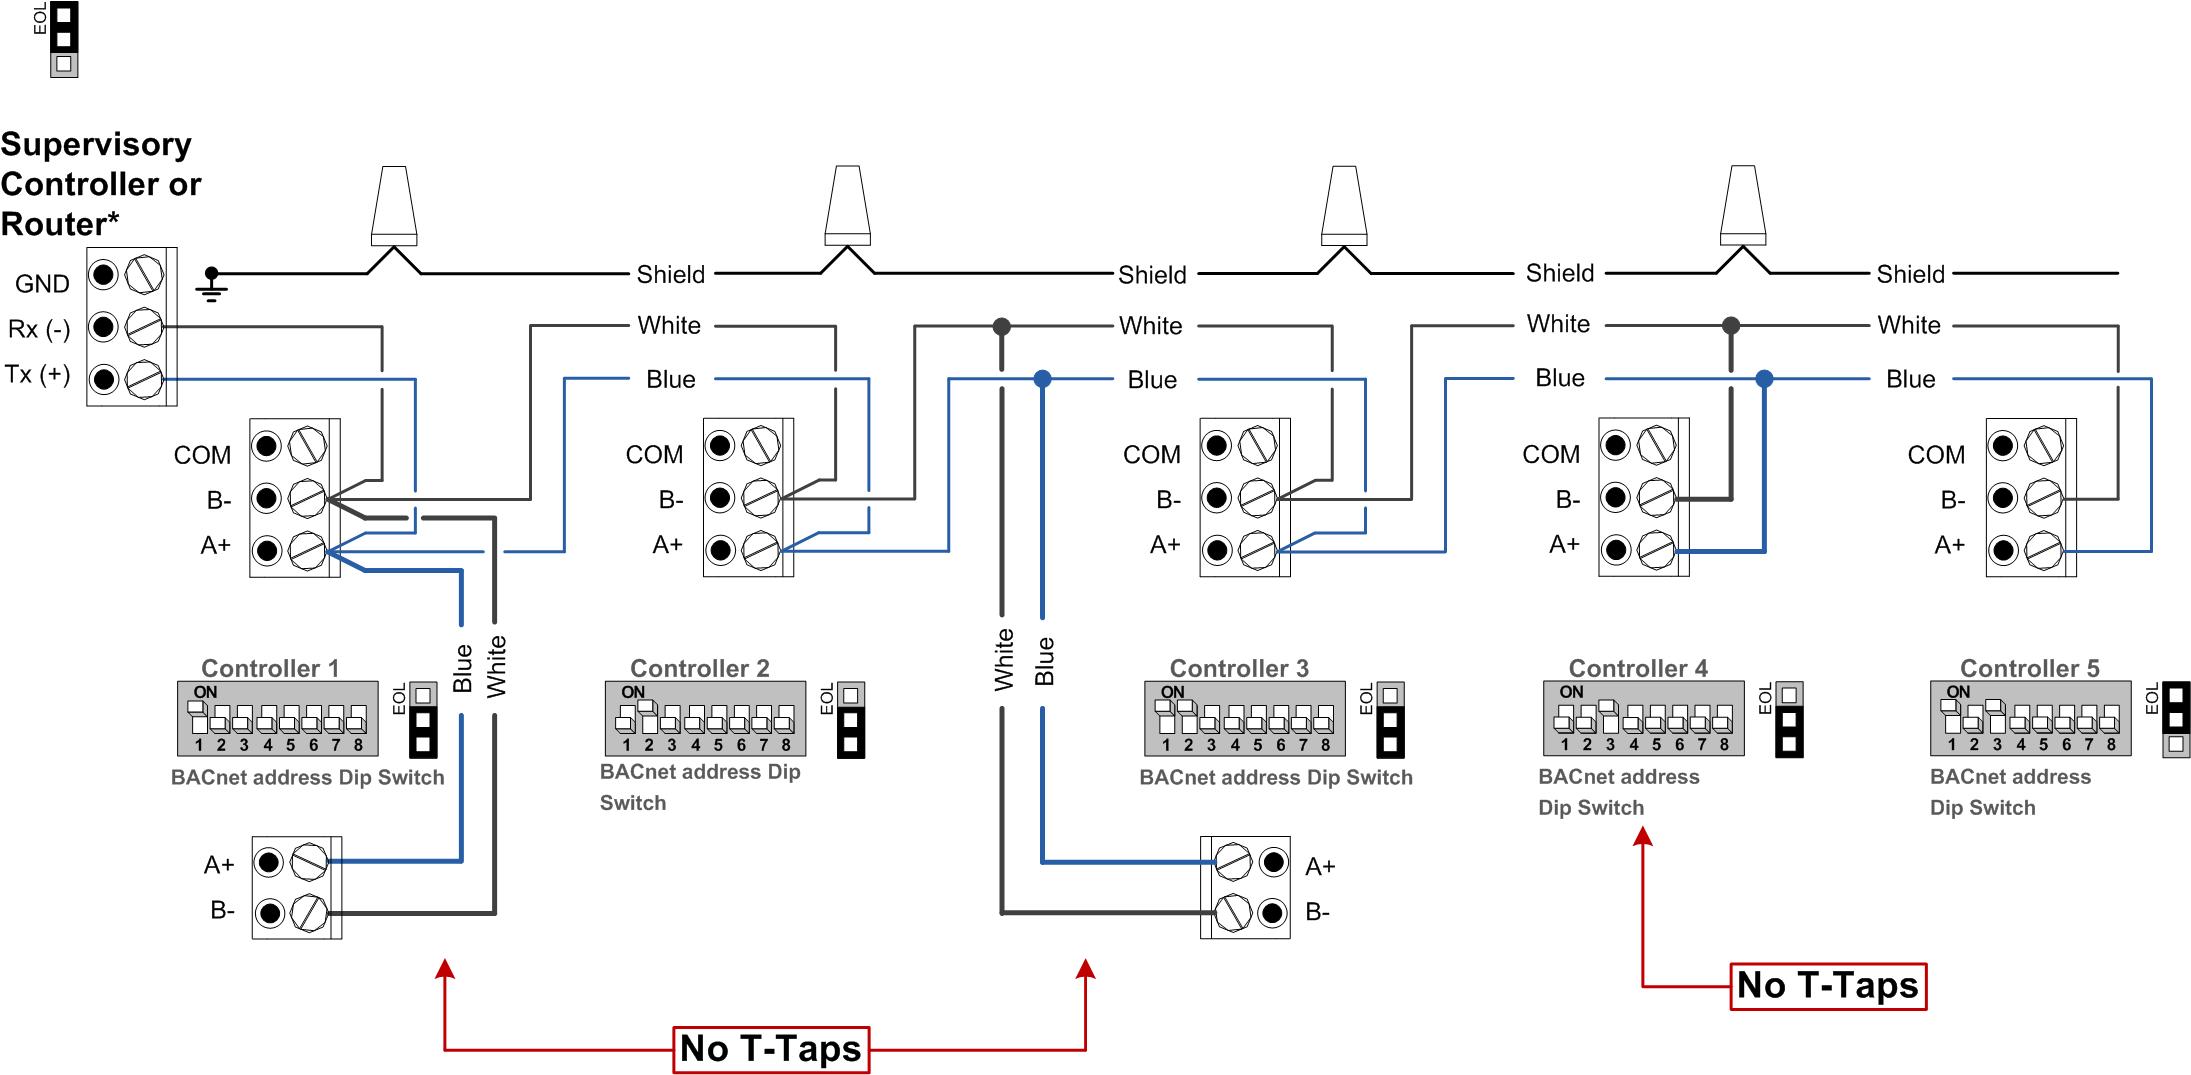 bacnet wiring diagram image 2